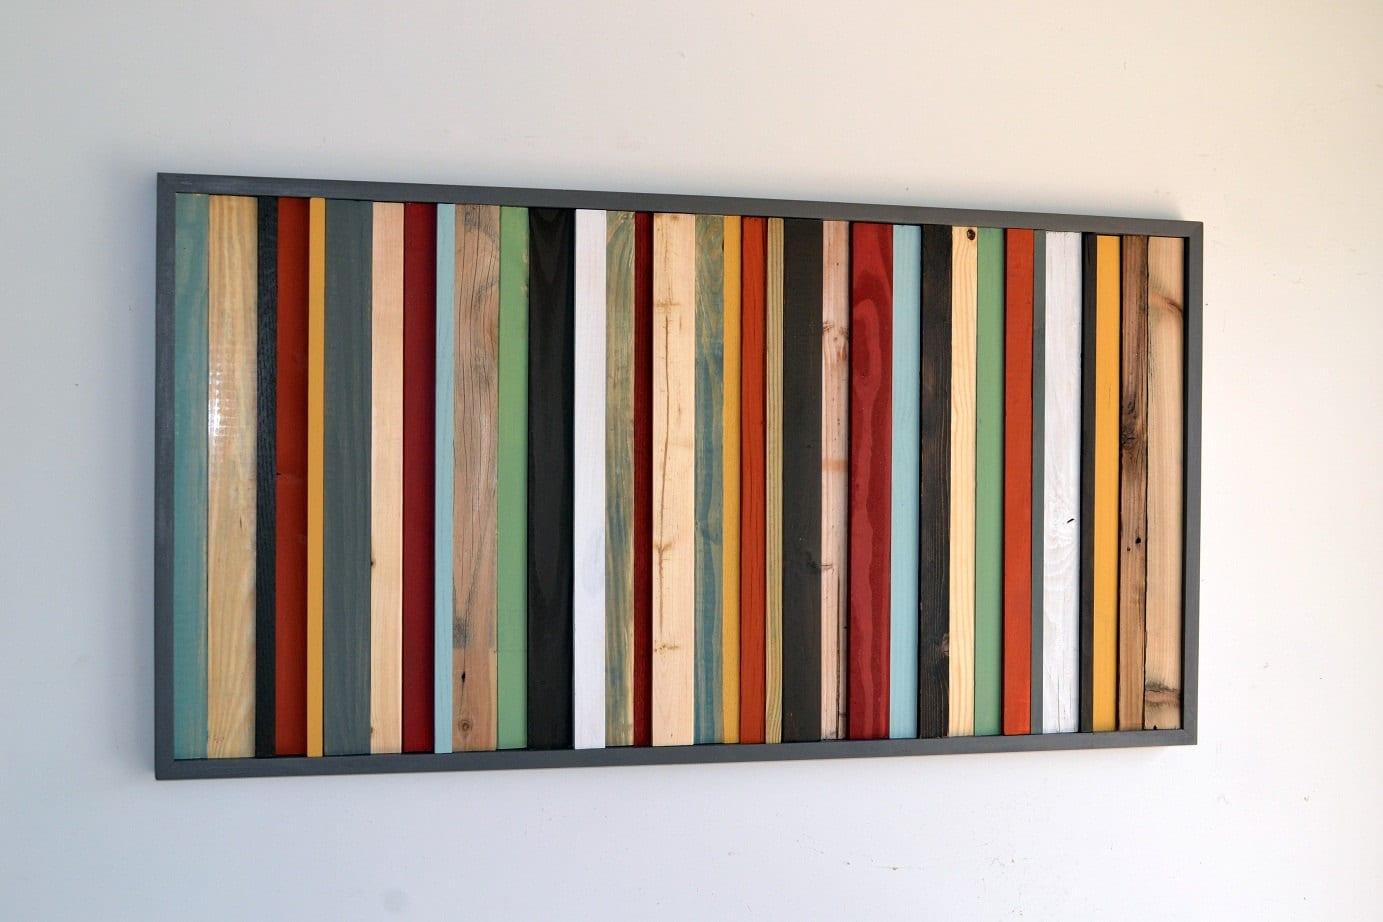 Superb Reclaimed Wood wood wall art